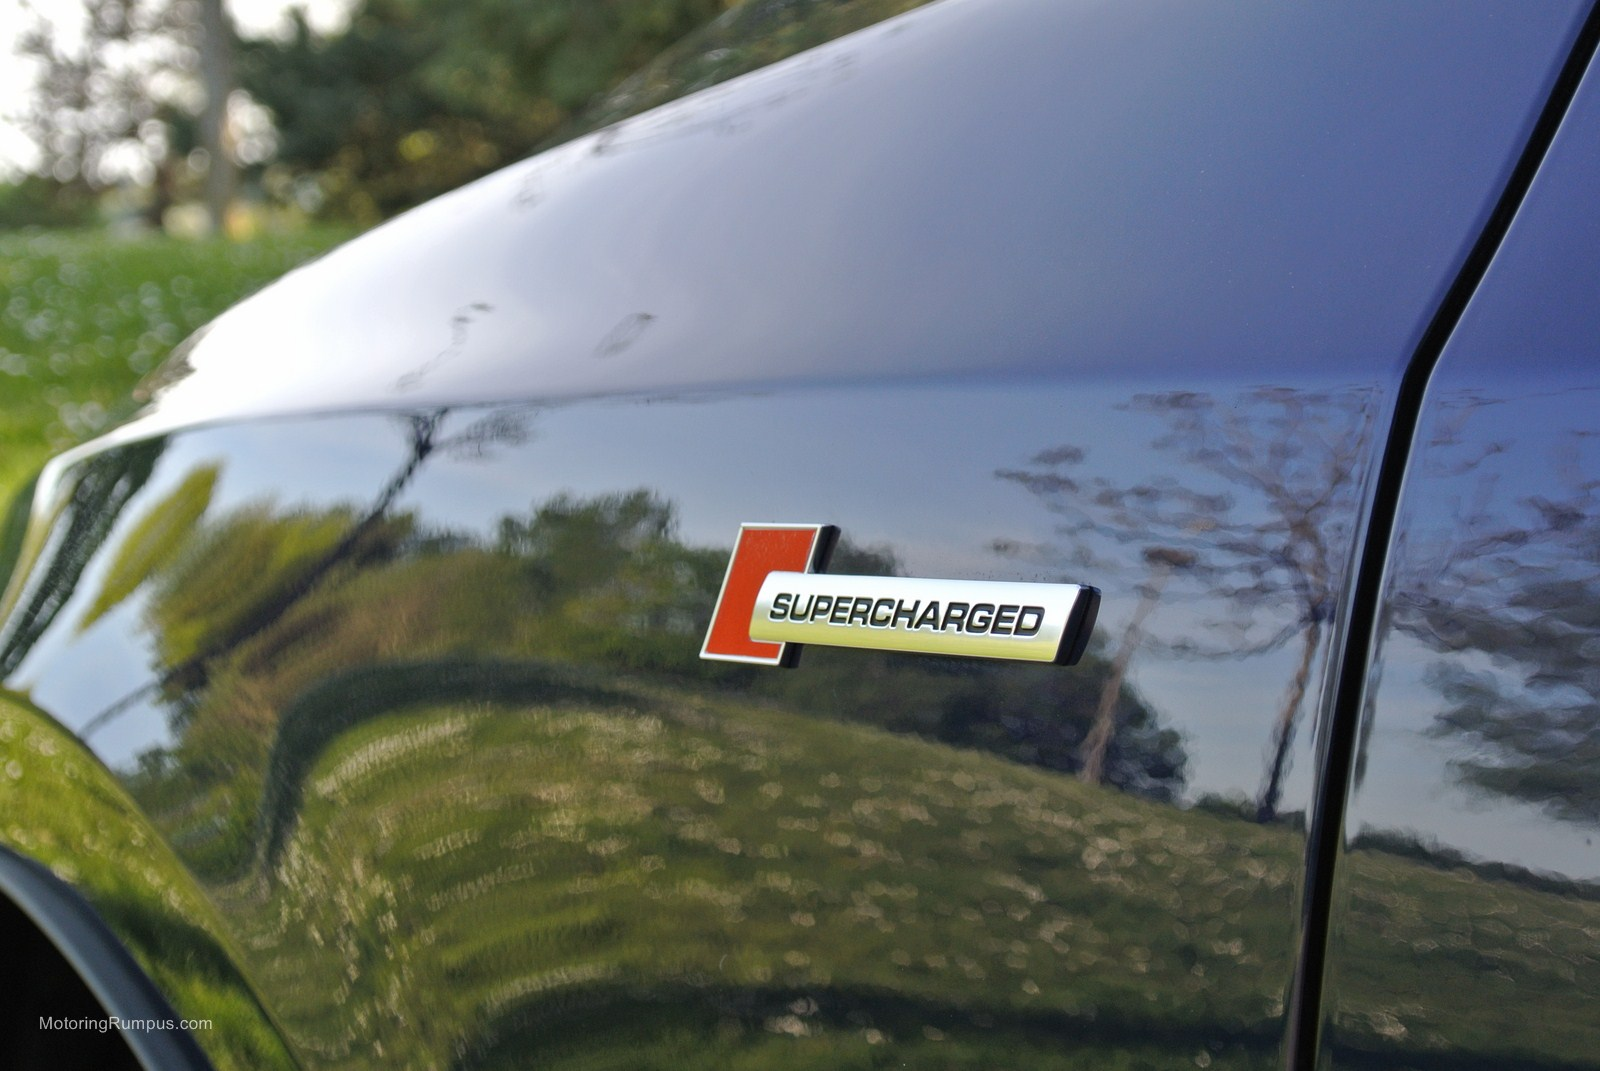 2014 Audi SQ5 Supercharged Badge